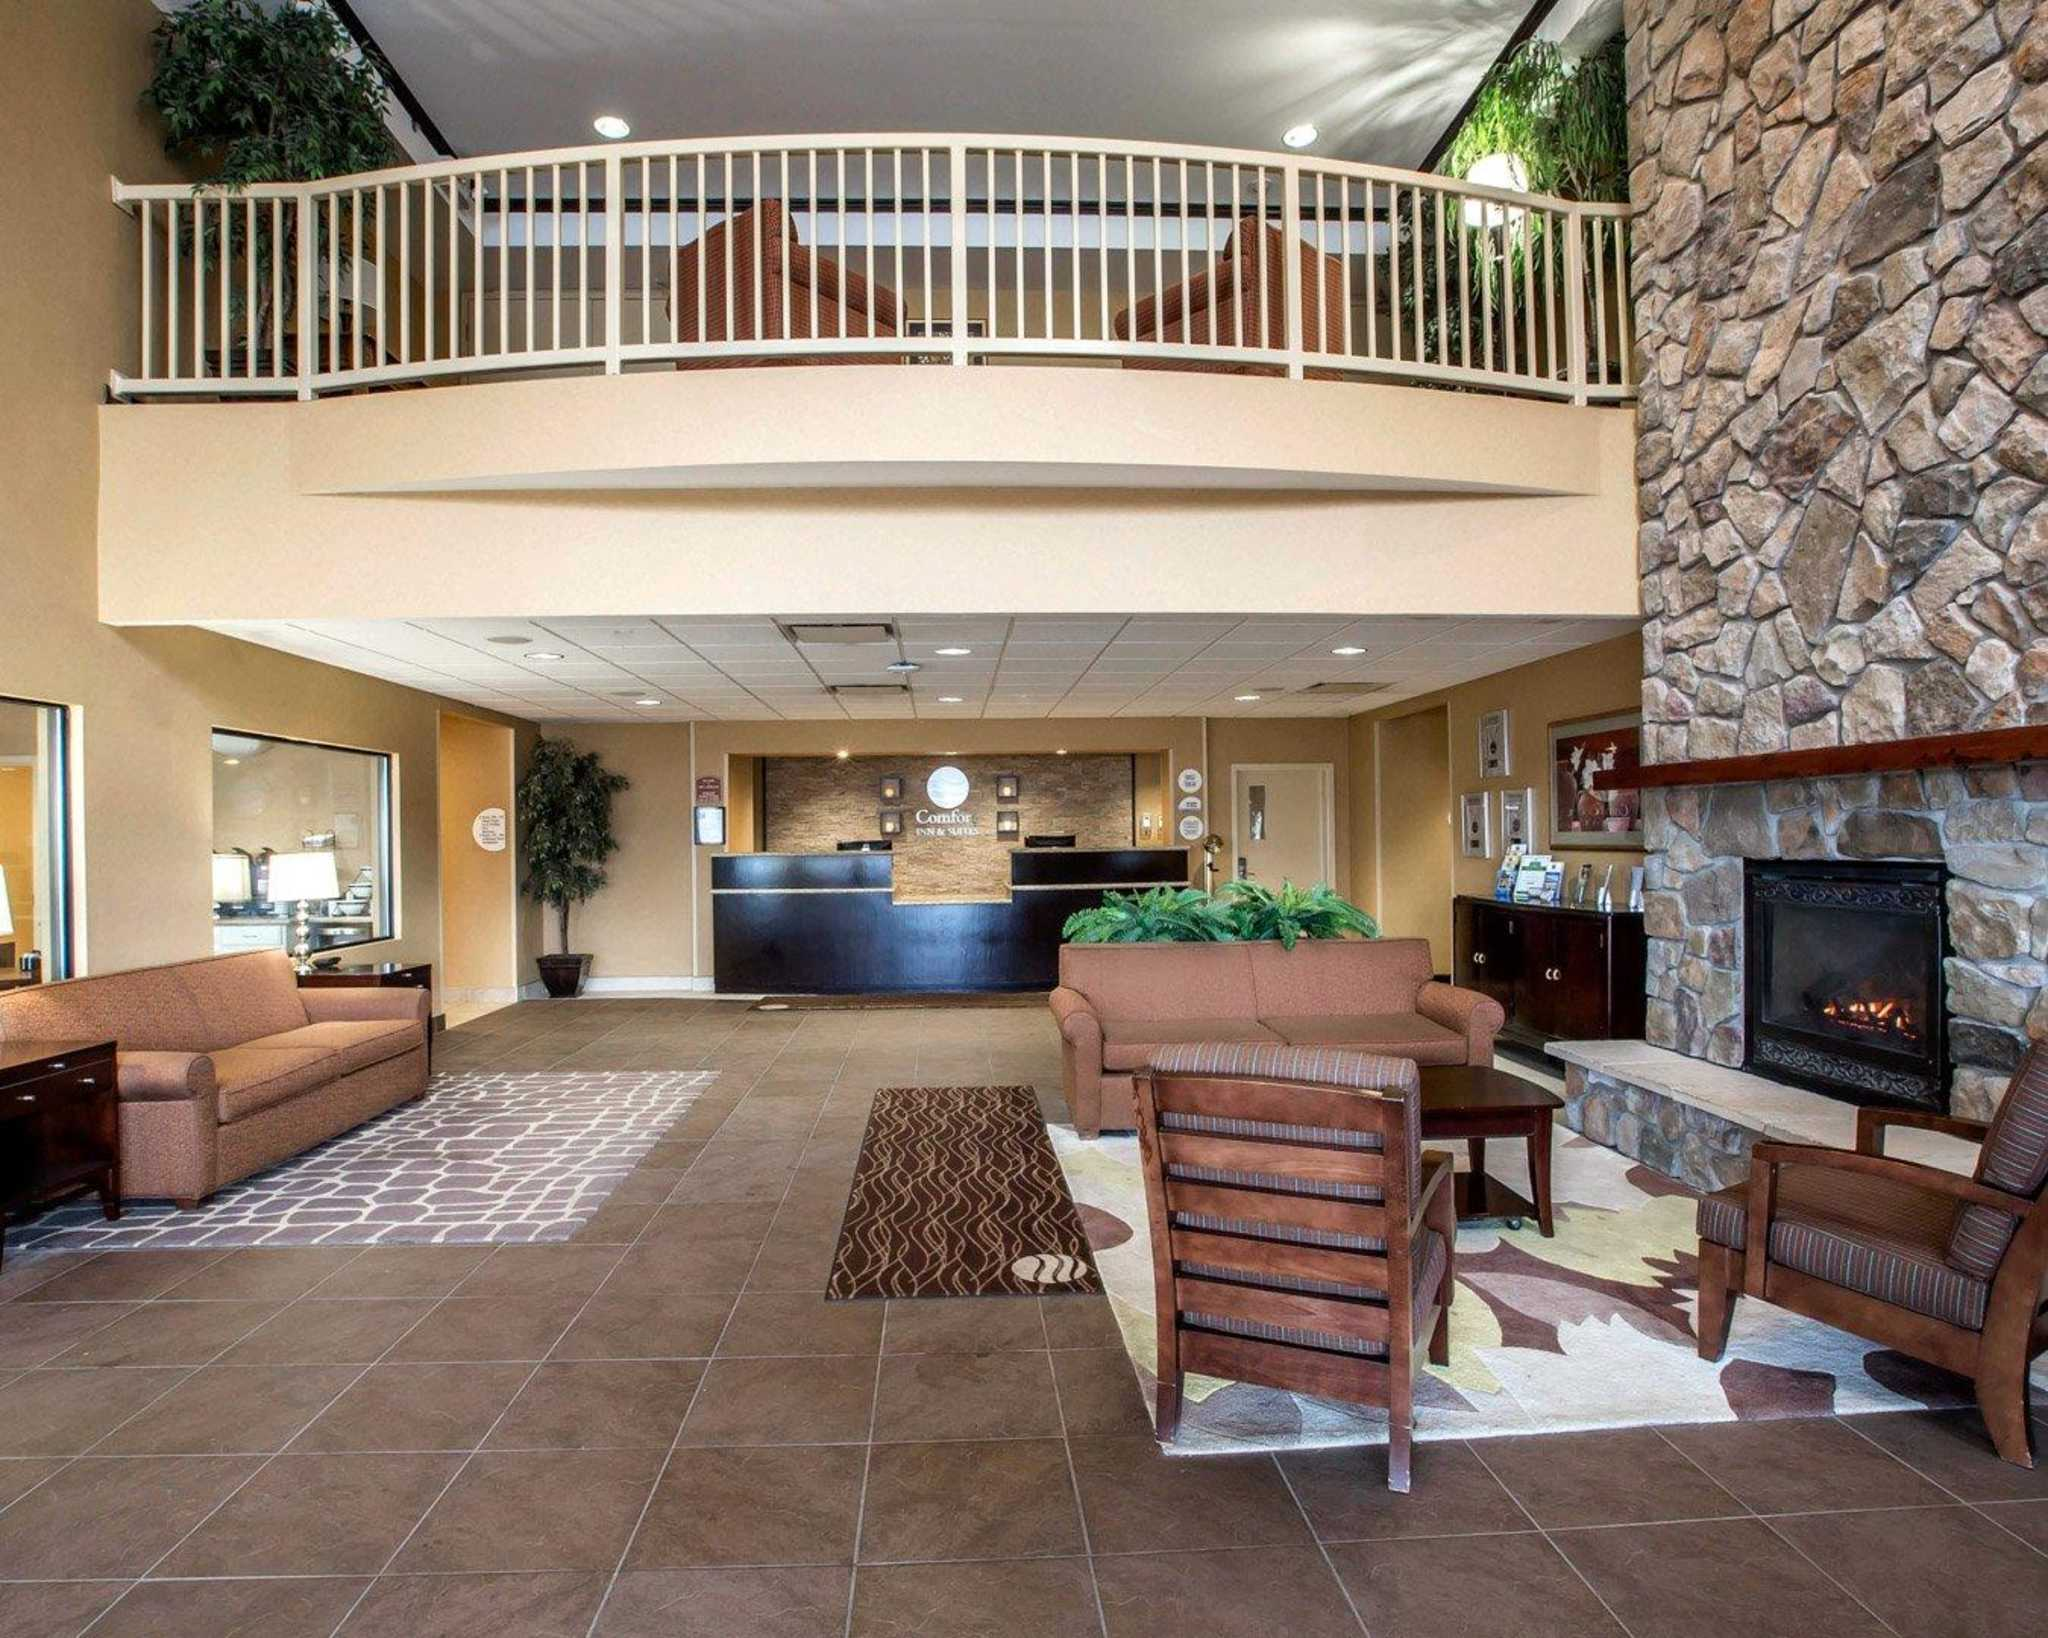 Comfort Inn & Suites adj to Akwesasne Mohawk Casino image 30